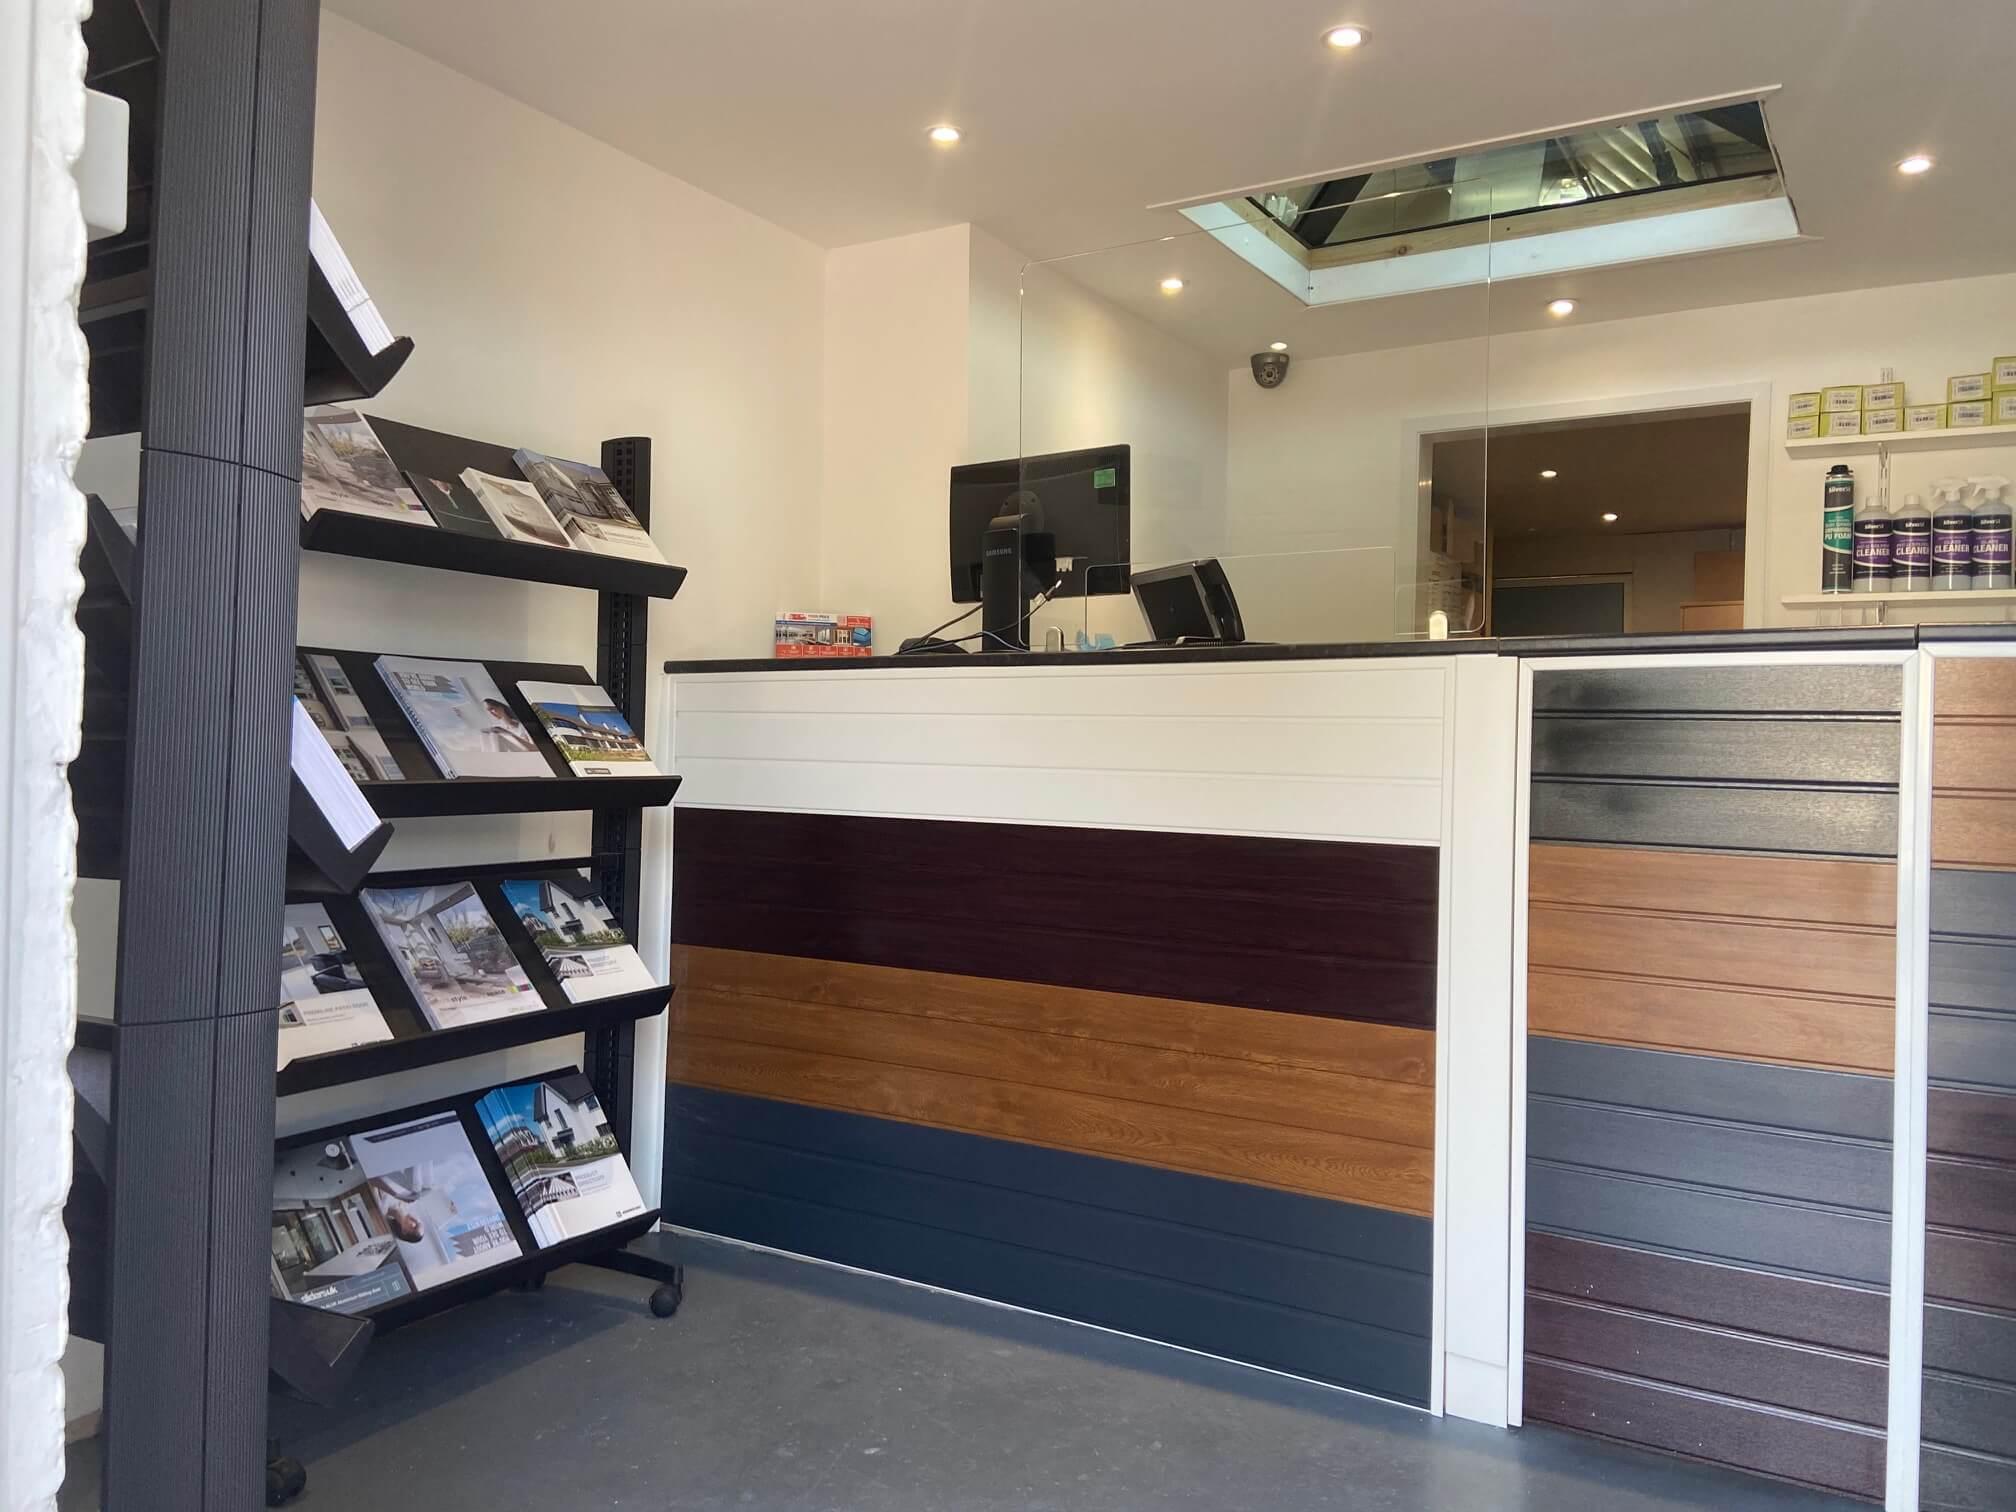 New Building Plastic Shop